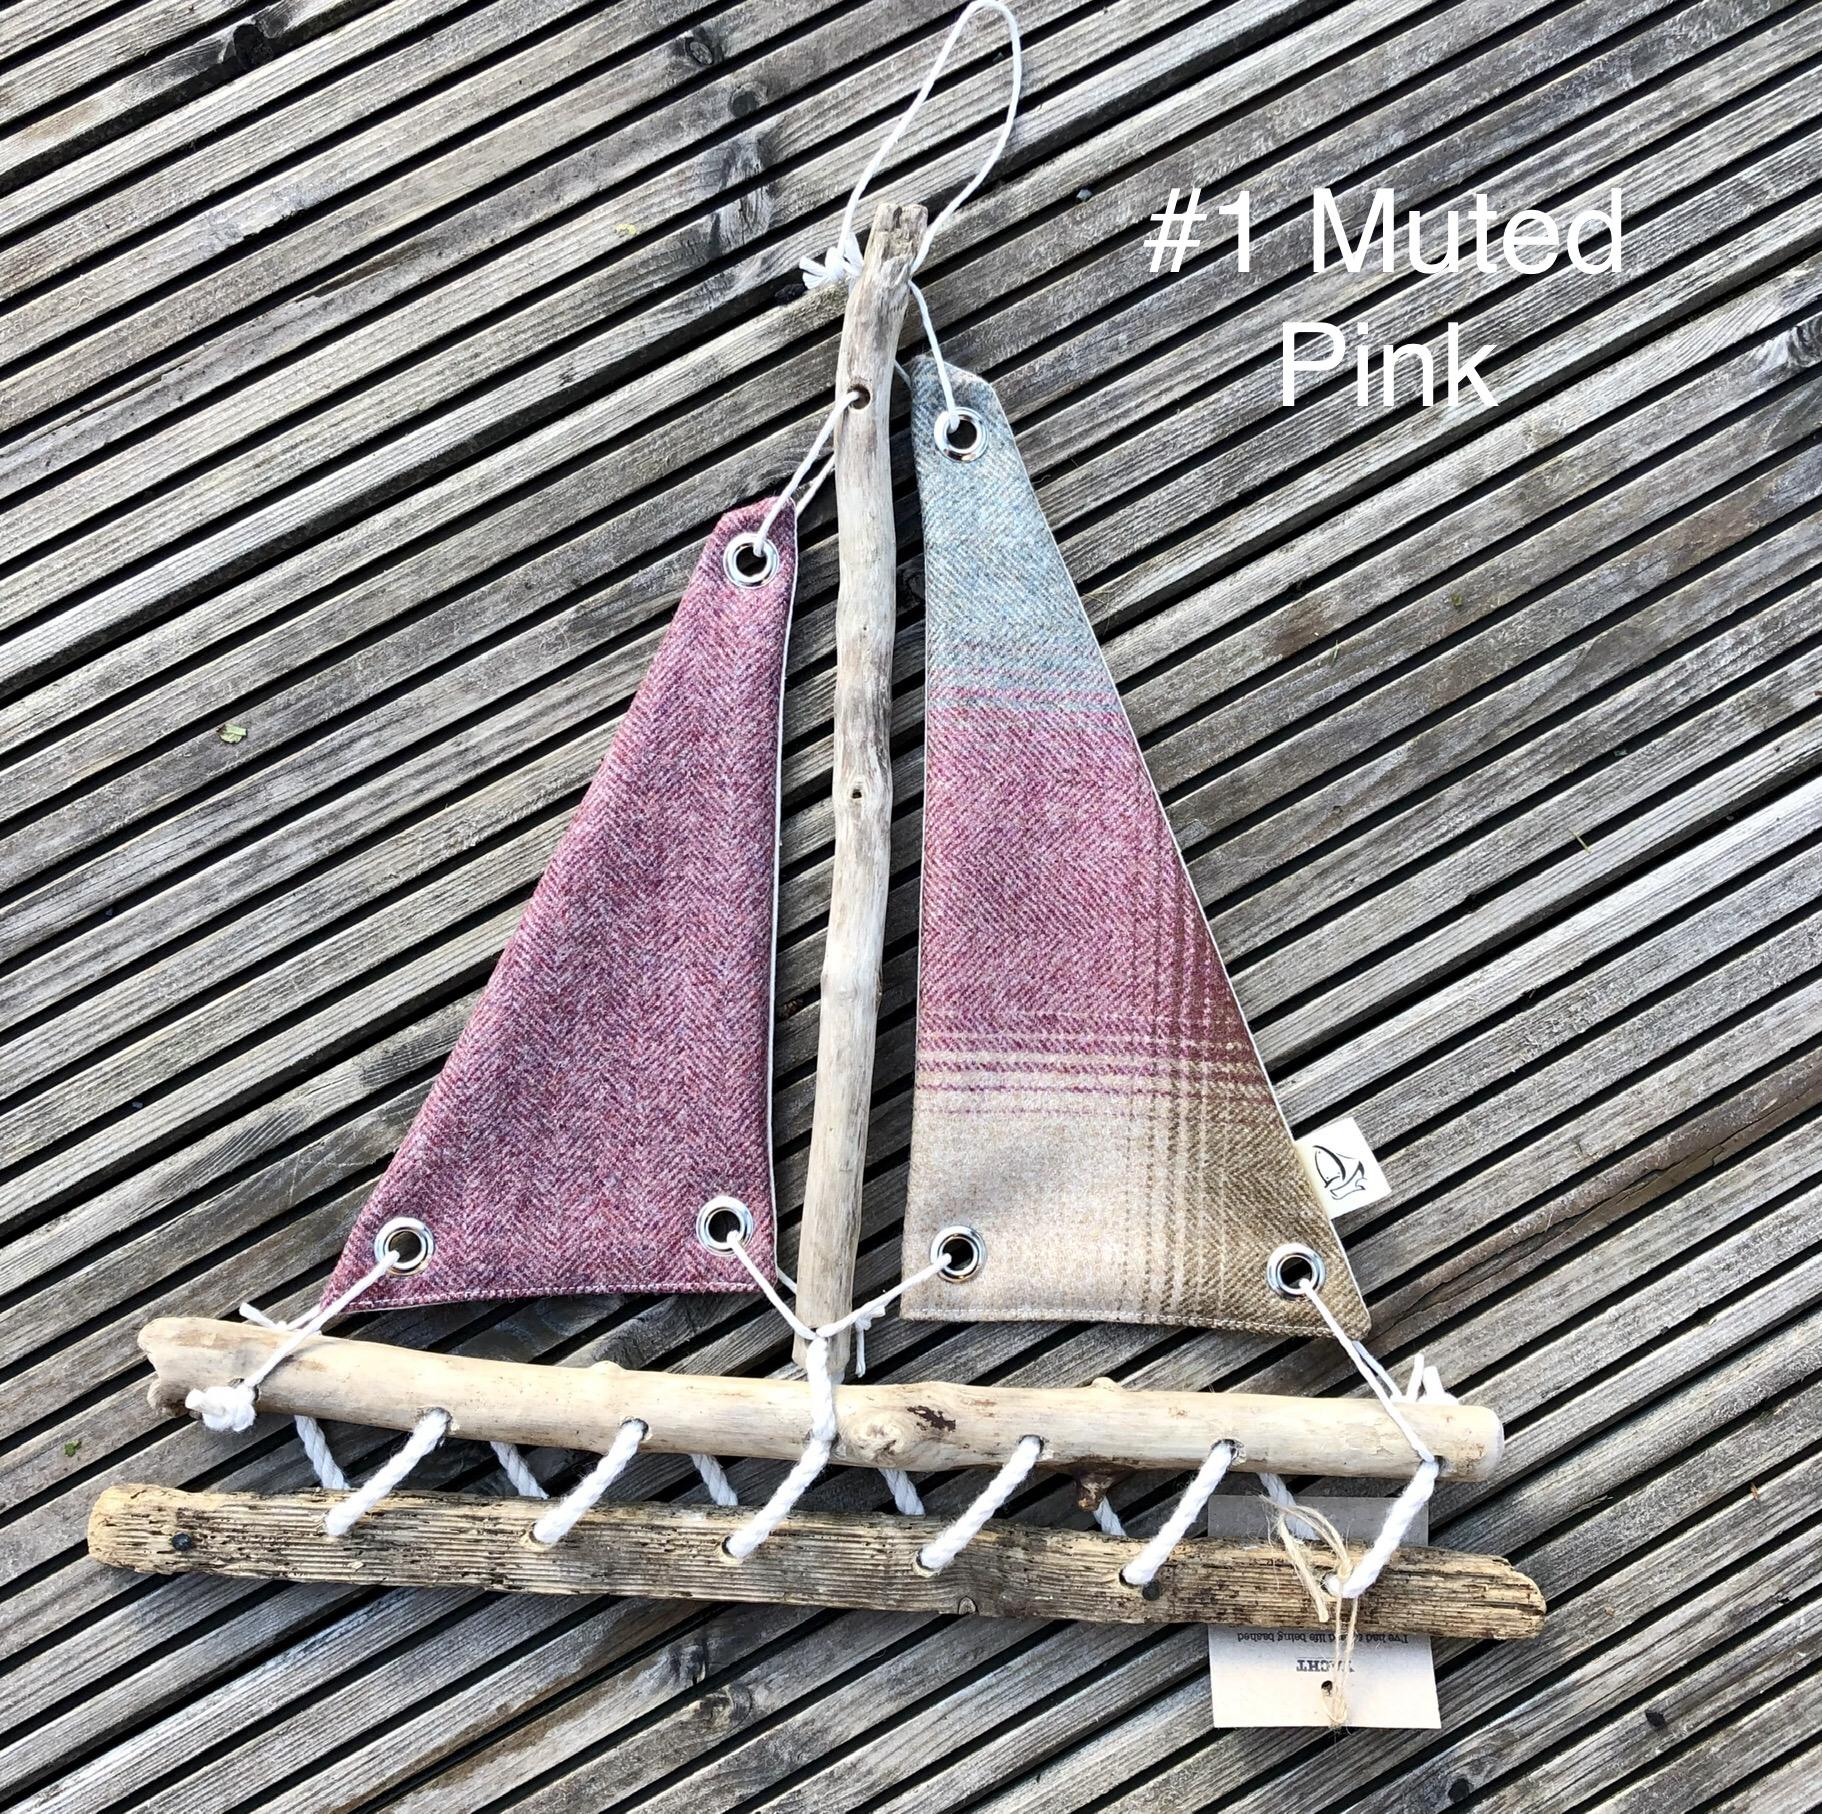 Driftwood Yacht, Handmade